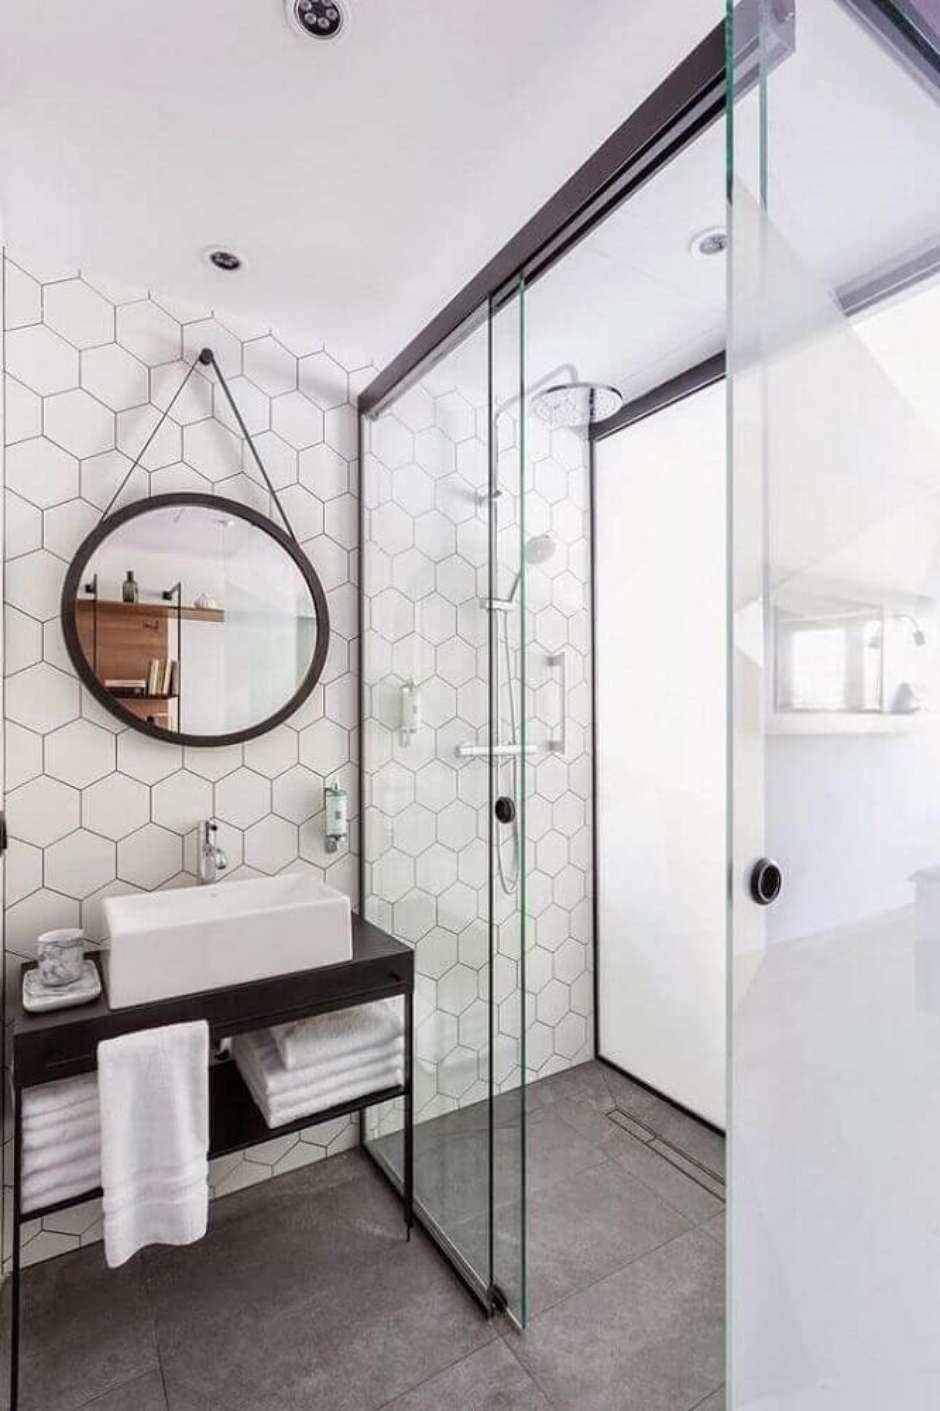 6 model kaca kamar mandi untuk kamar mandi yang lebih bersih